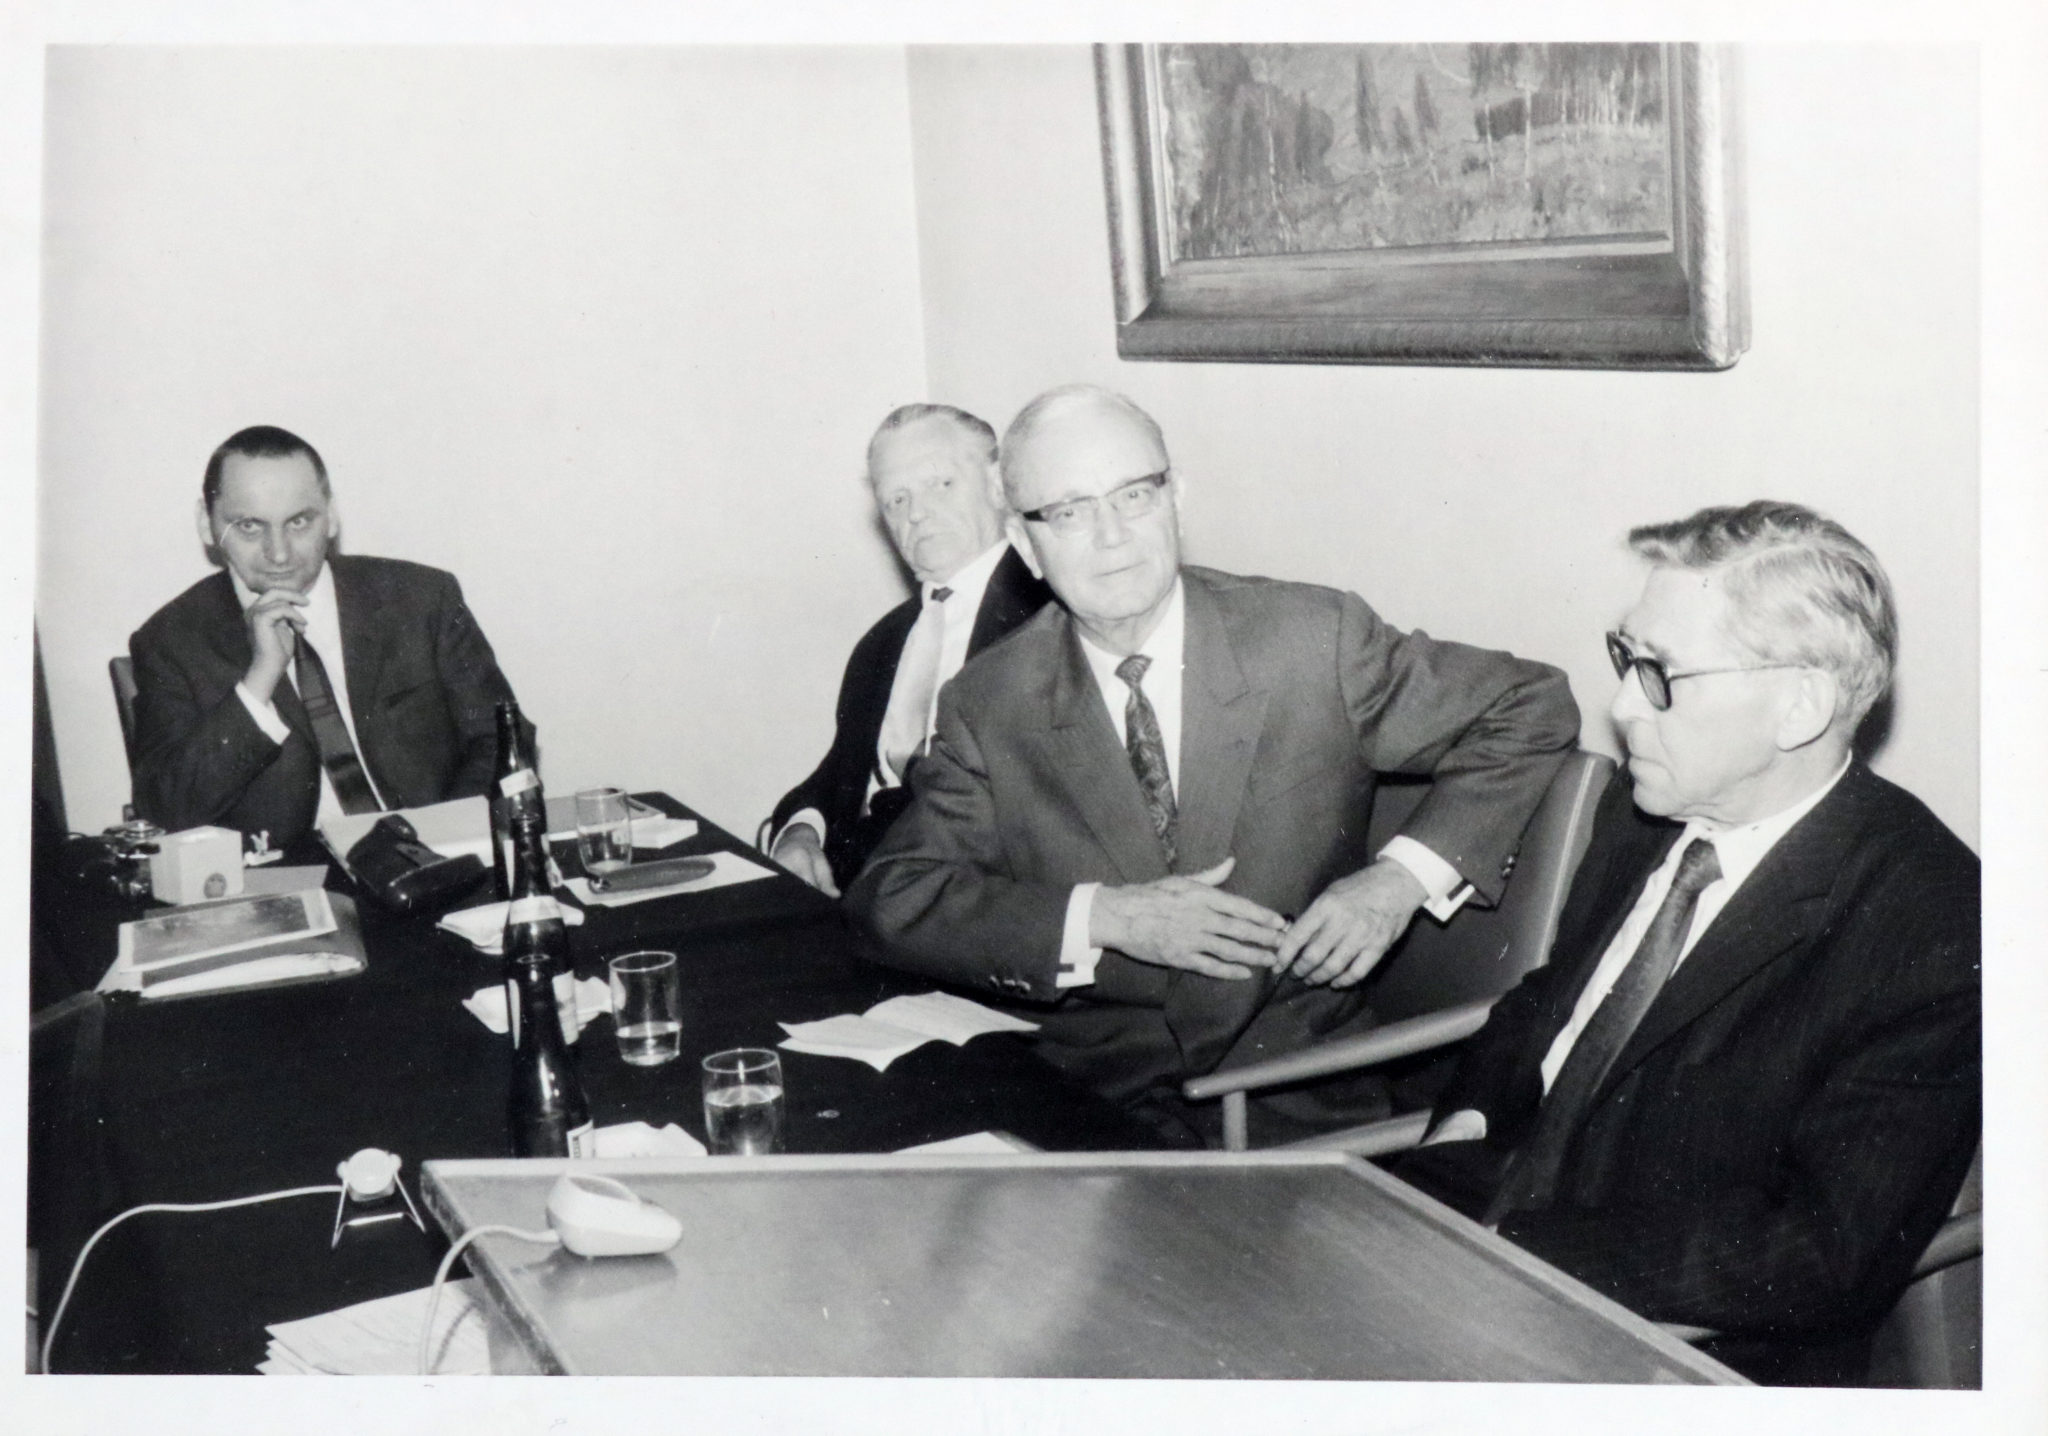 Wiesbaden 1968